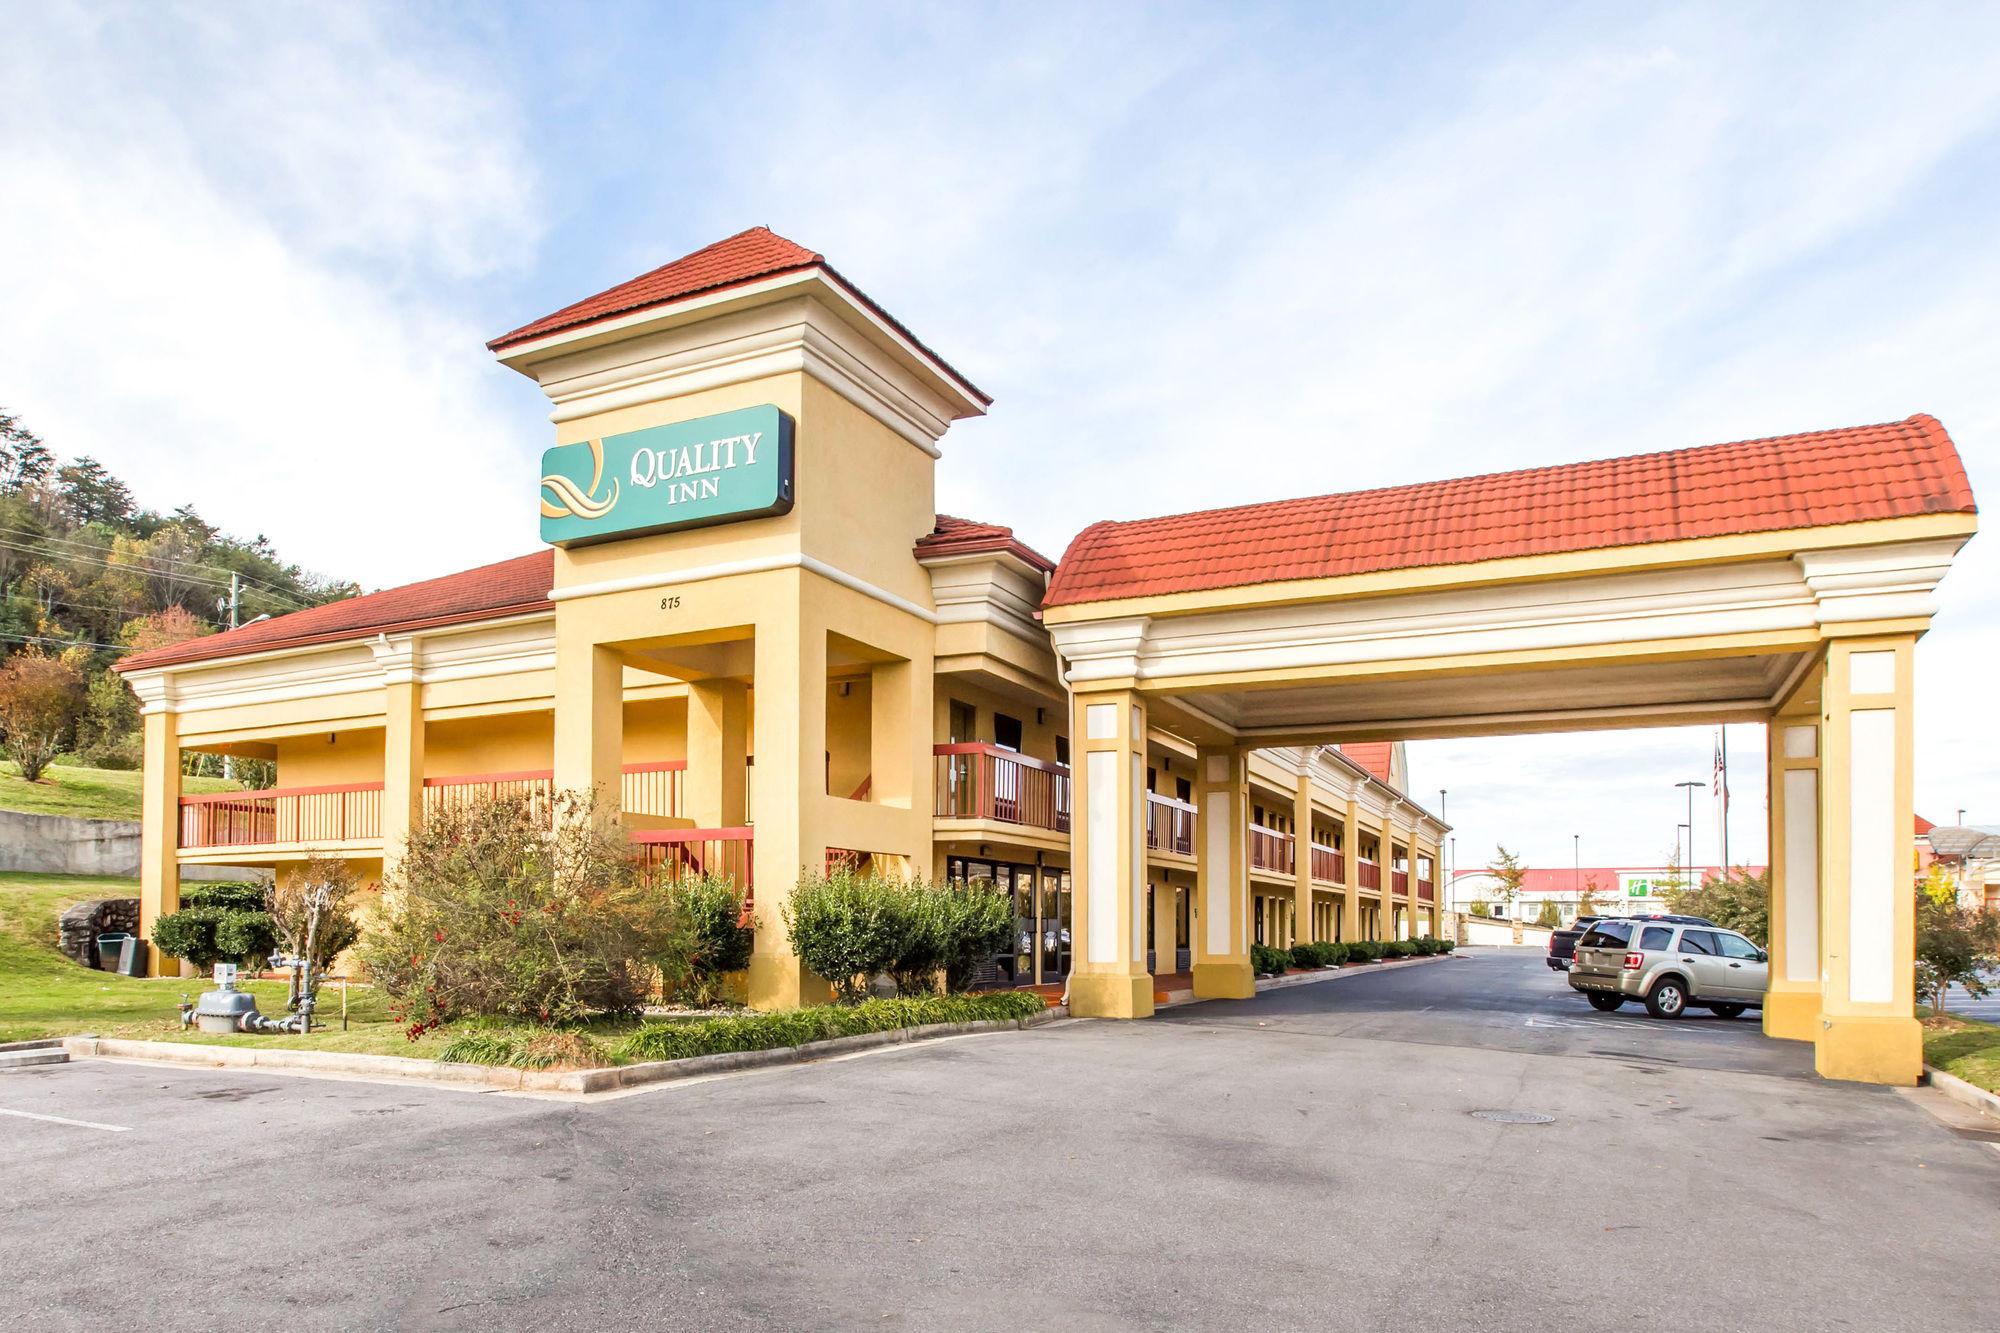 Quality Inn in Dalton, GA